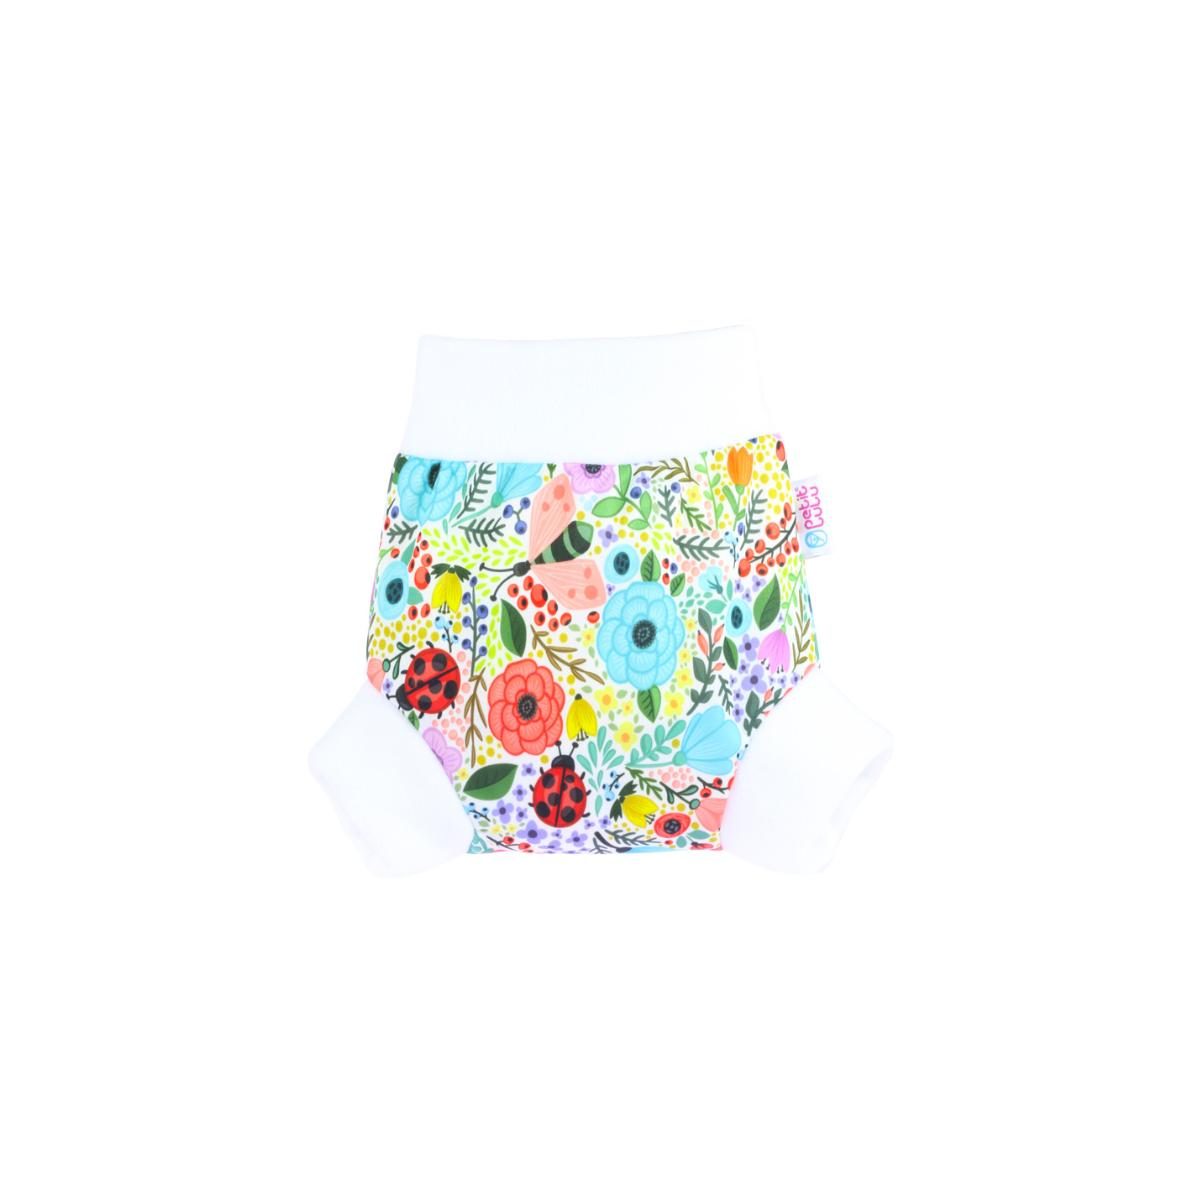 Petit Lulu Pull-up svrchní kalhotky, vel. M 1 ks, Rozkvetlá zahrada